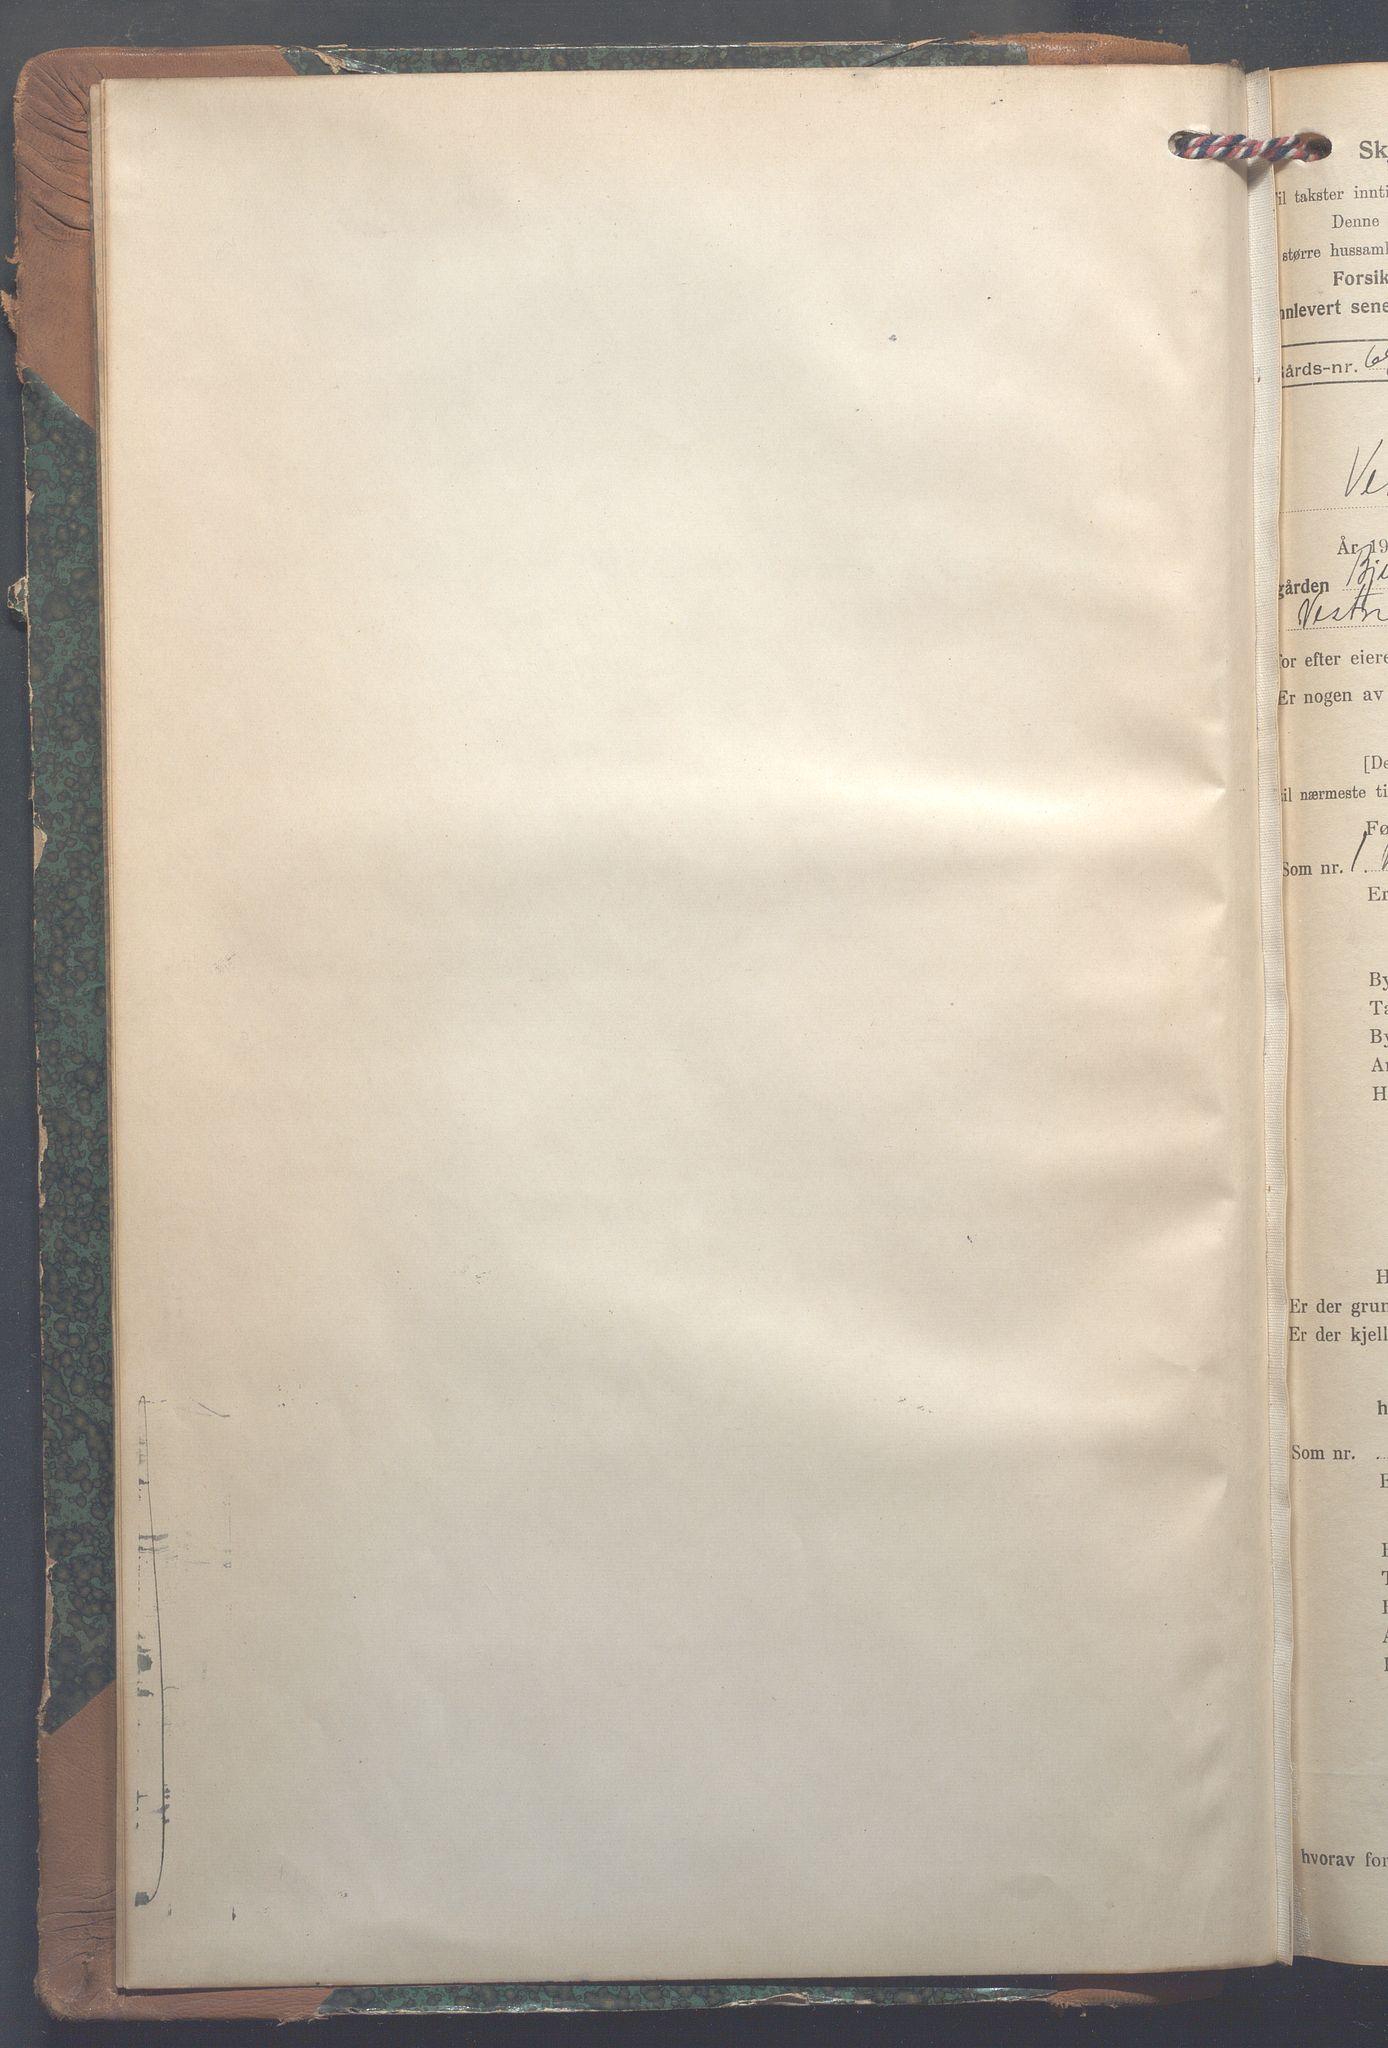 OBA, Lensmennene i Aker, F/Fa/L0022: Branntakstprotokoll, 1922-1949